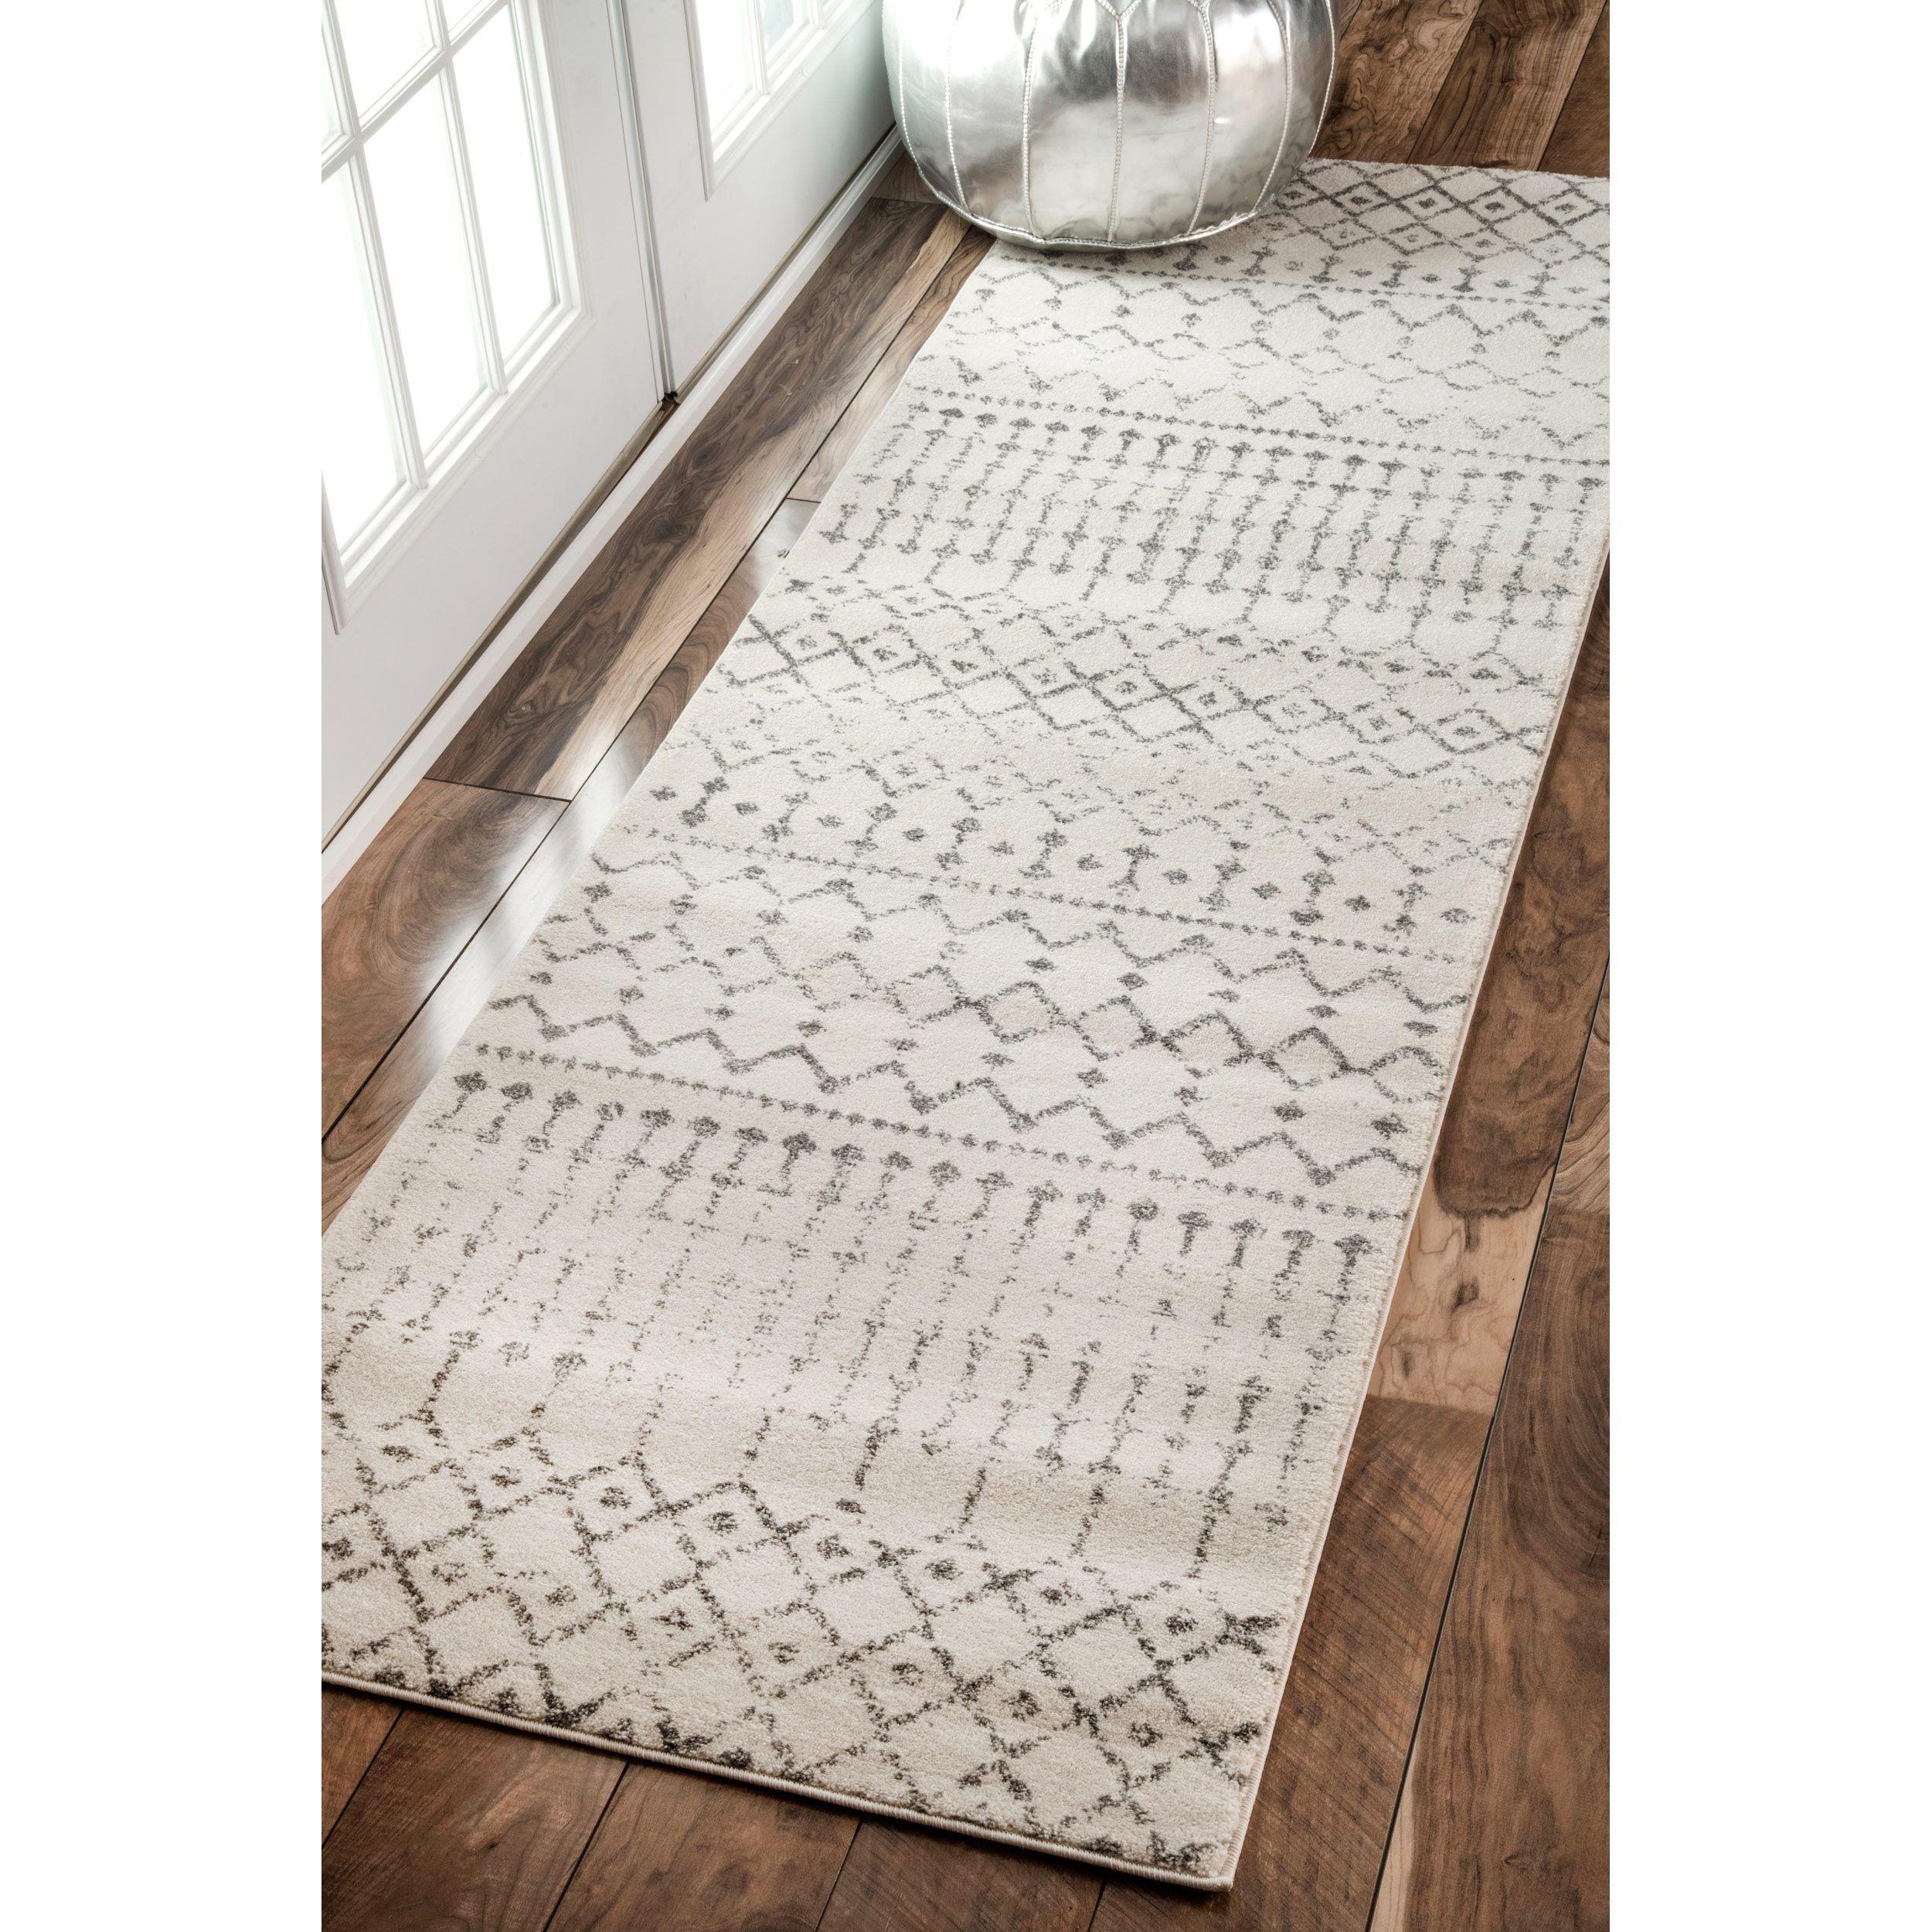 nuLOOM Geometric Moroccan Beads Grey Runner Rug 2 8 x 8 Grey